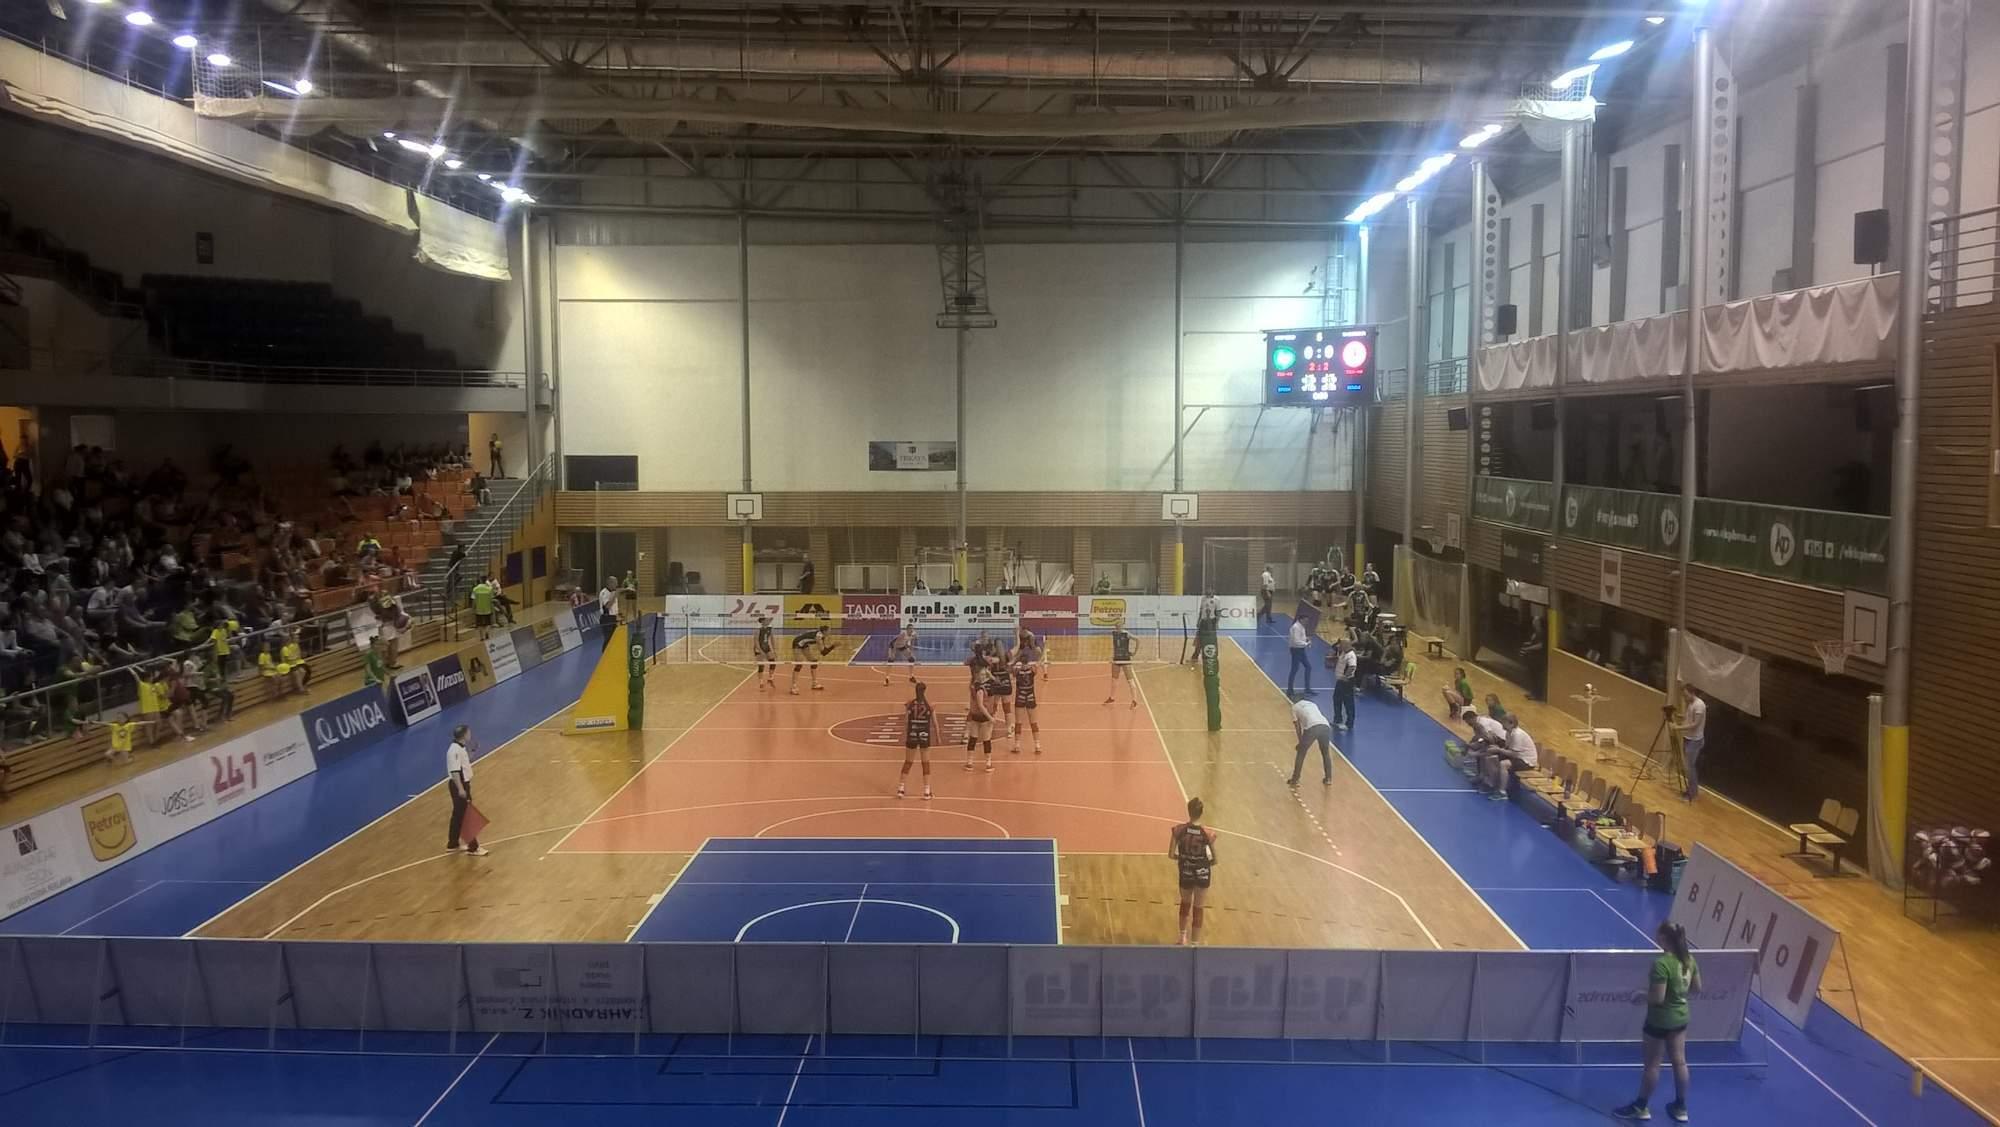 Ostravské volejbalistky porazily Brno a radují se z bronzu